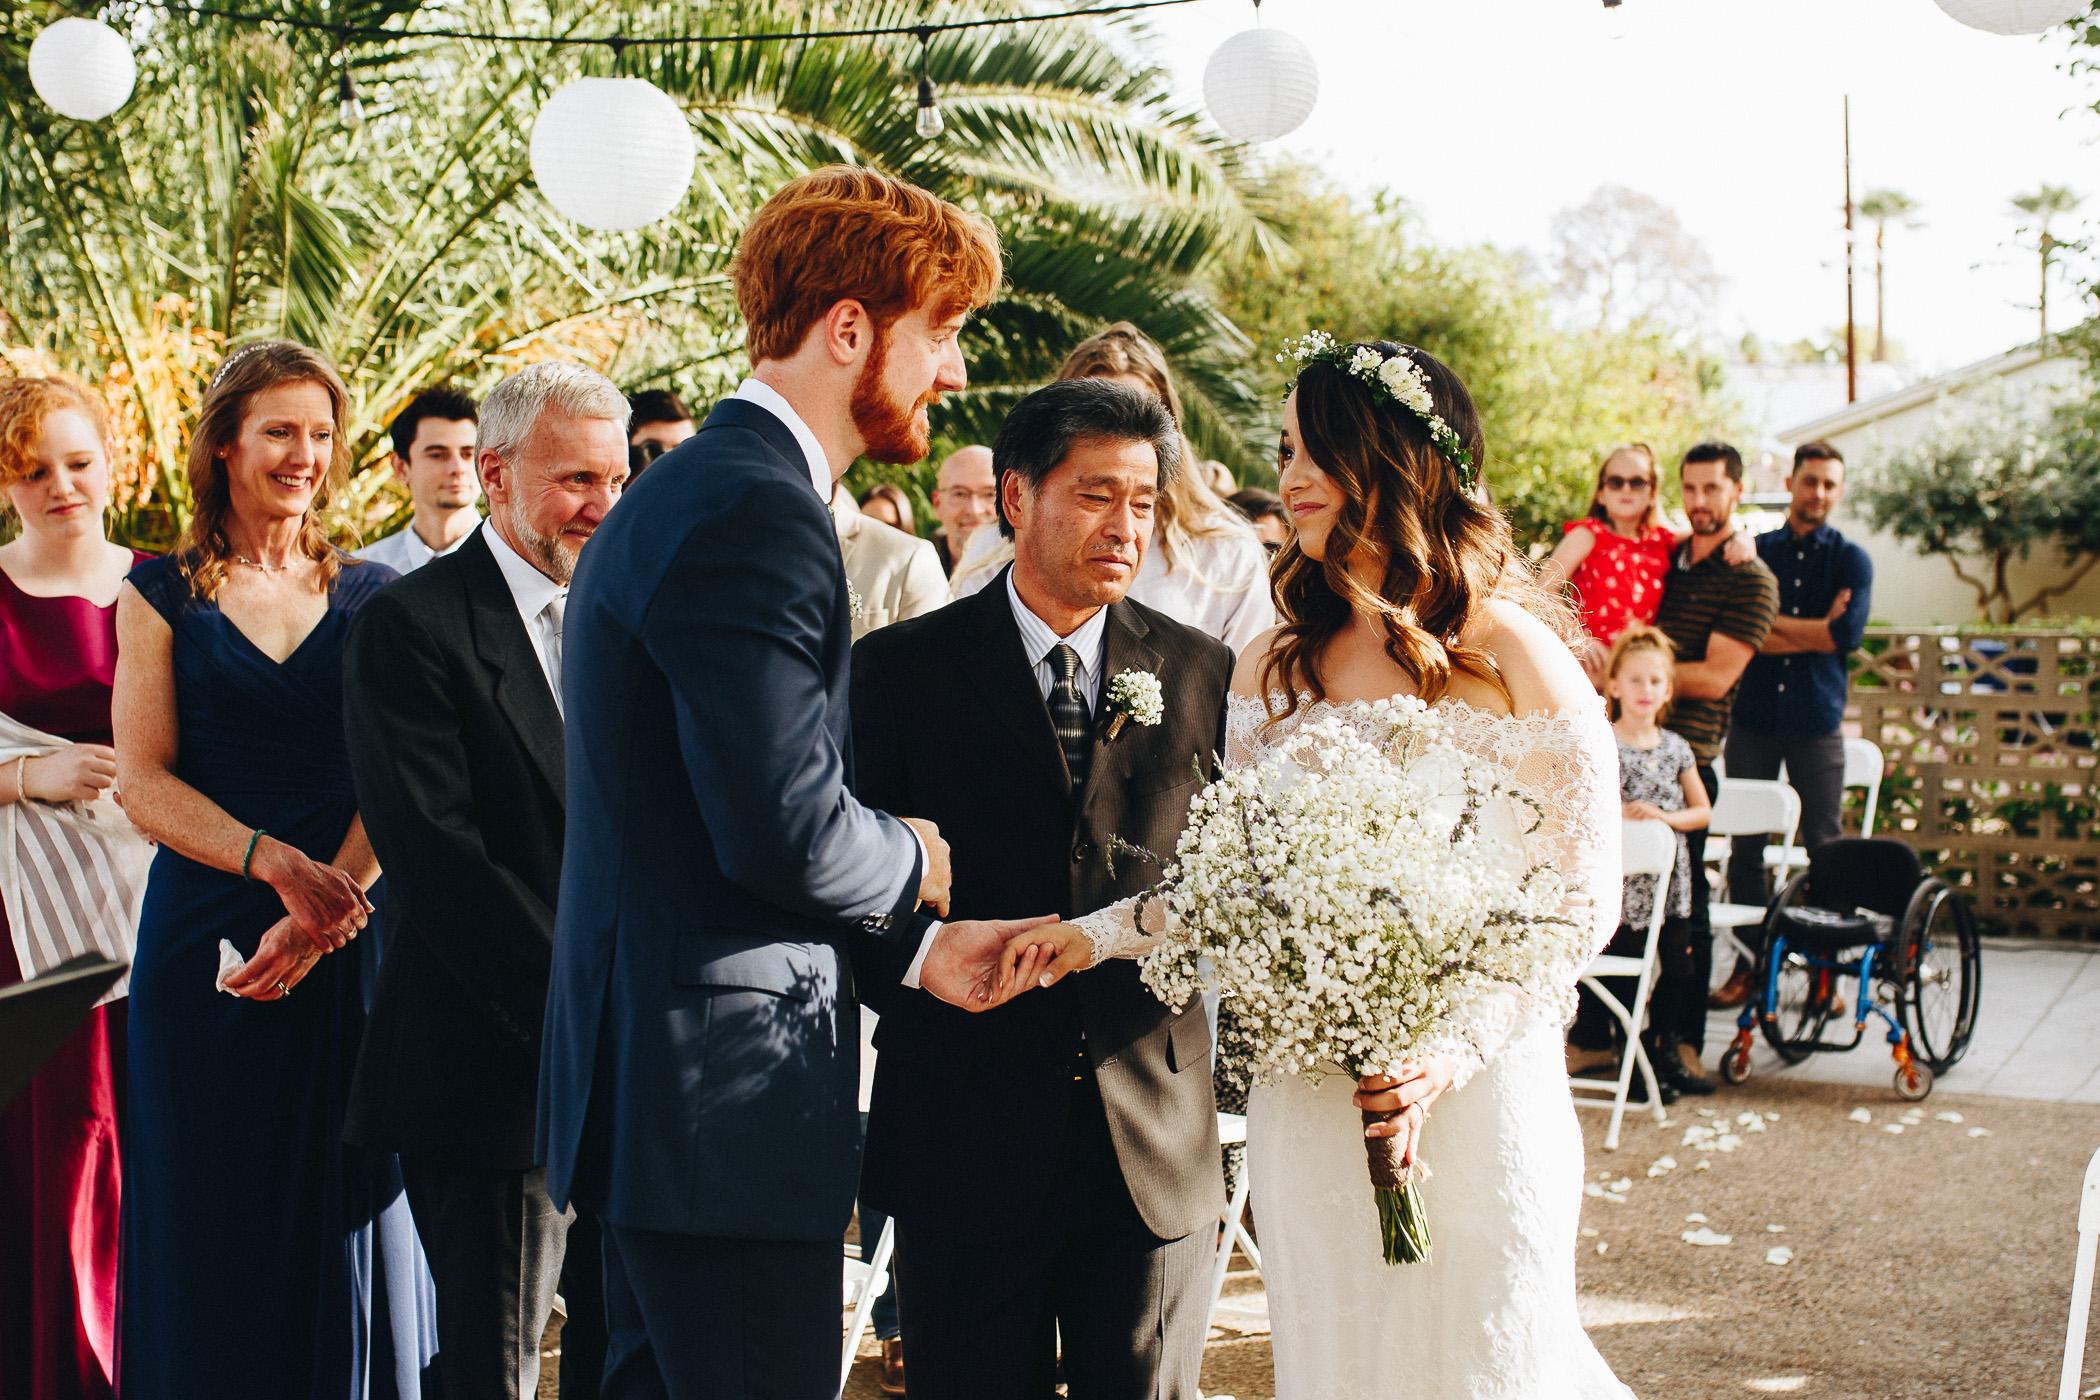 181104-Luxium-Weddings-Arizona-@matt__Le-Brandon-Kariana-Phoenix-Valley-Garden-Center-1052.jpg